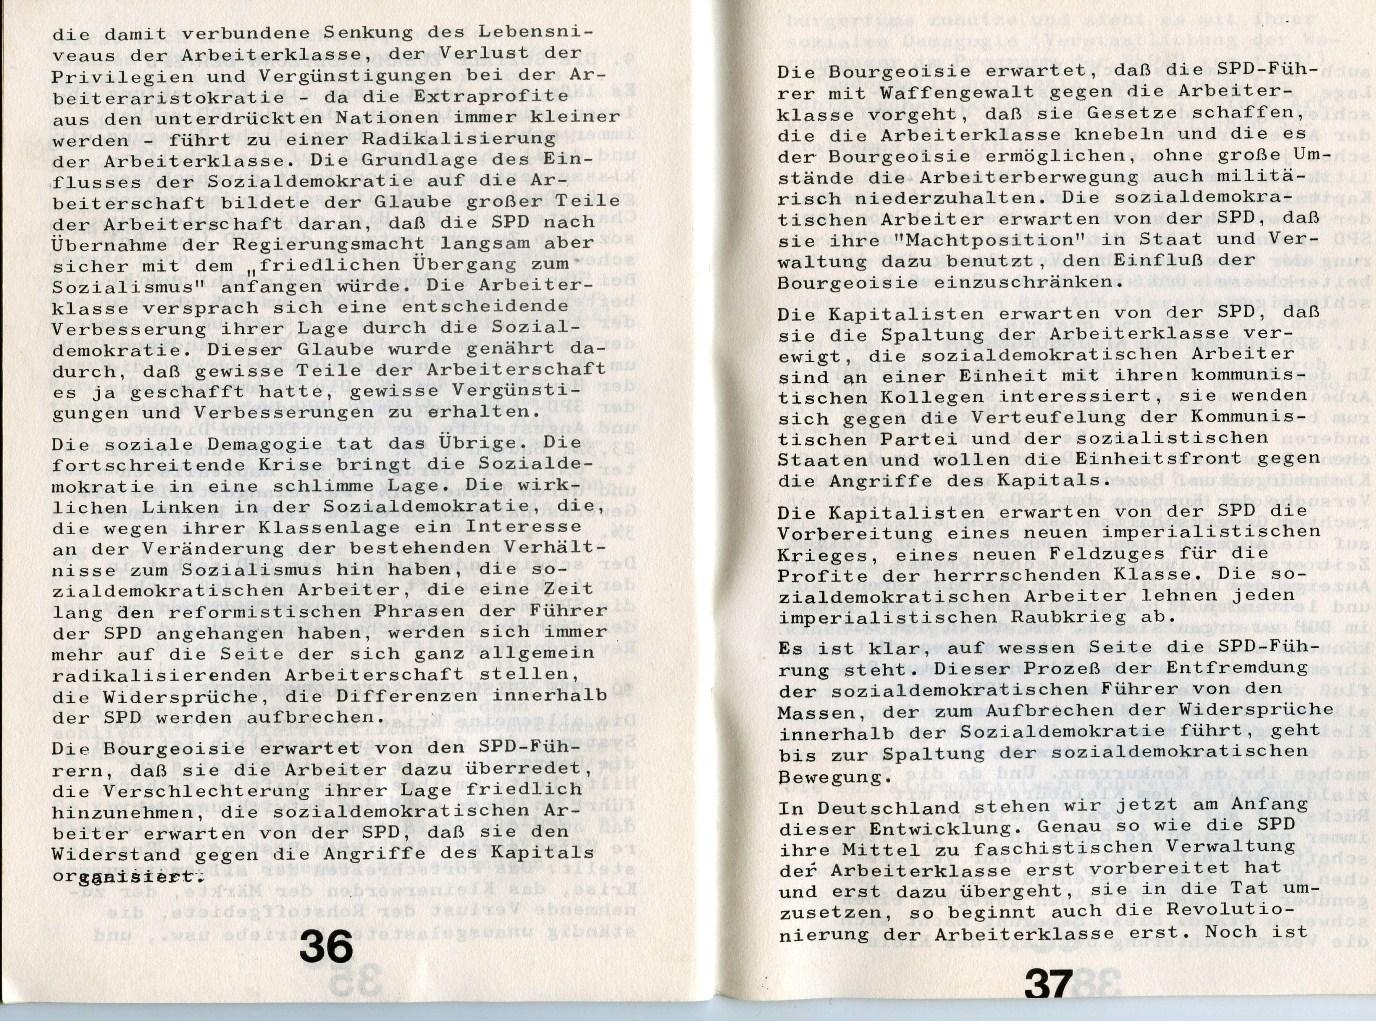 KJVD_Sozialdemokratie_Sozialfaschismus_1971_20